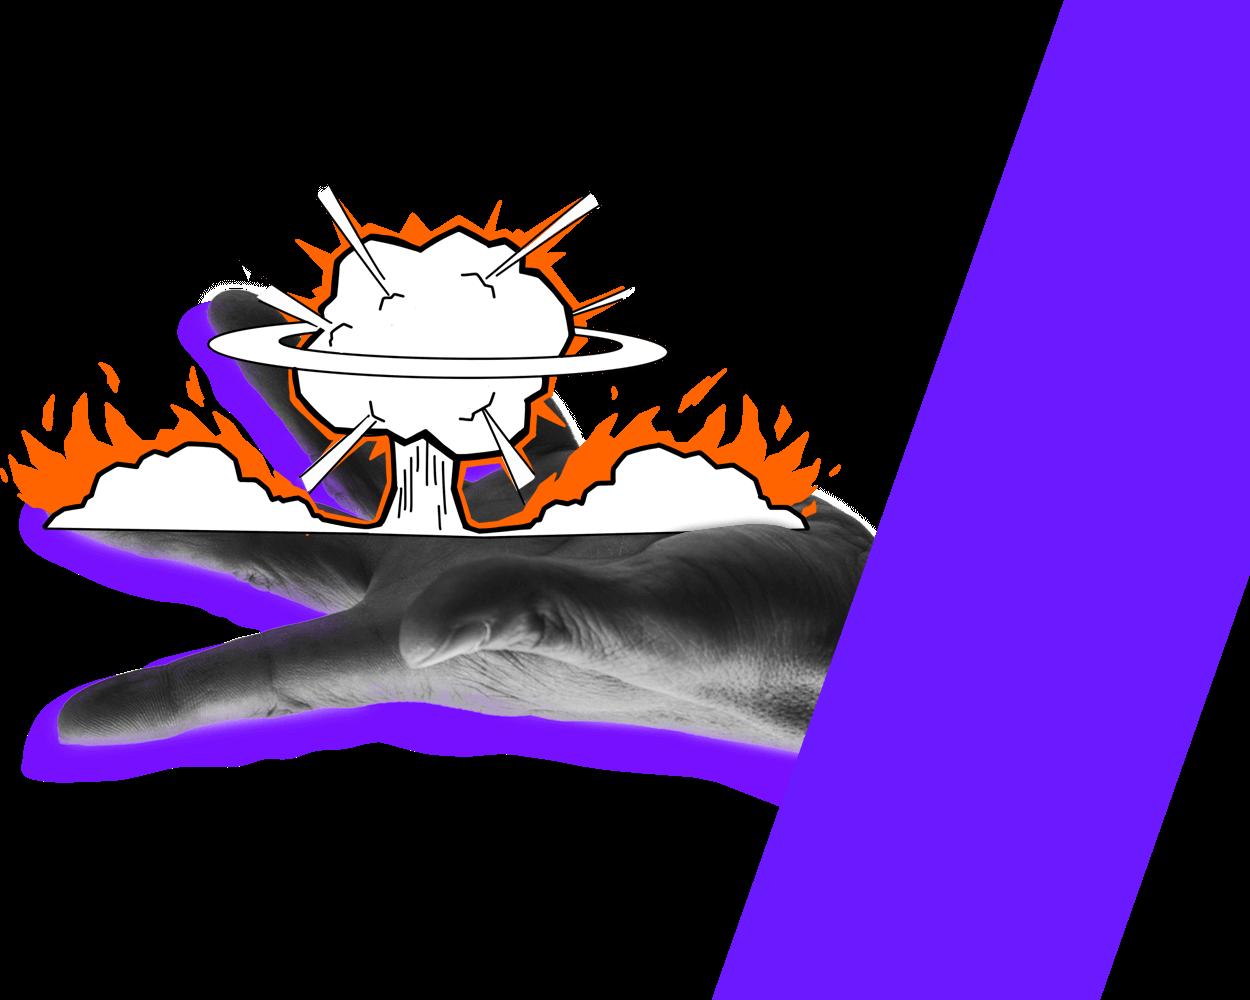 Explode Hand